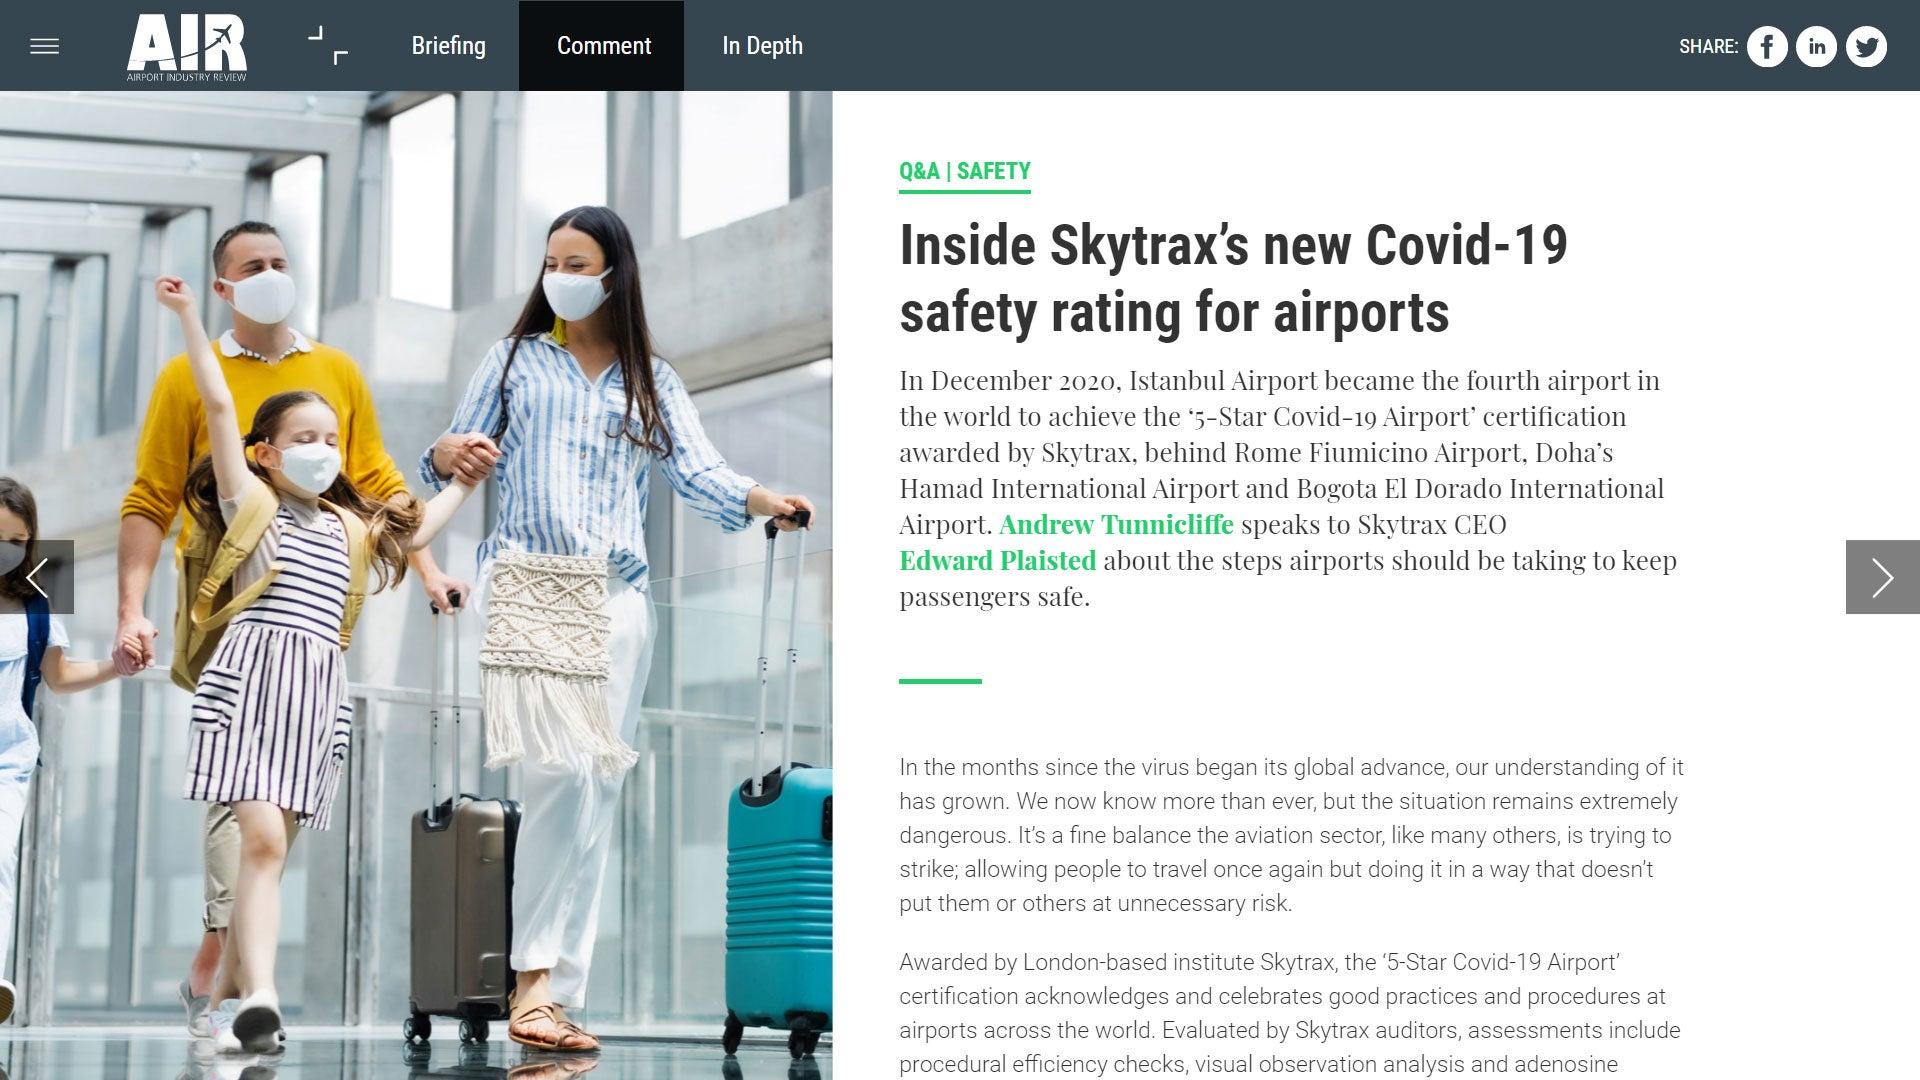 Covid-19 safety at airports